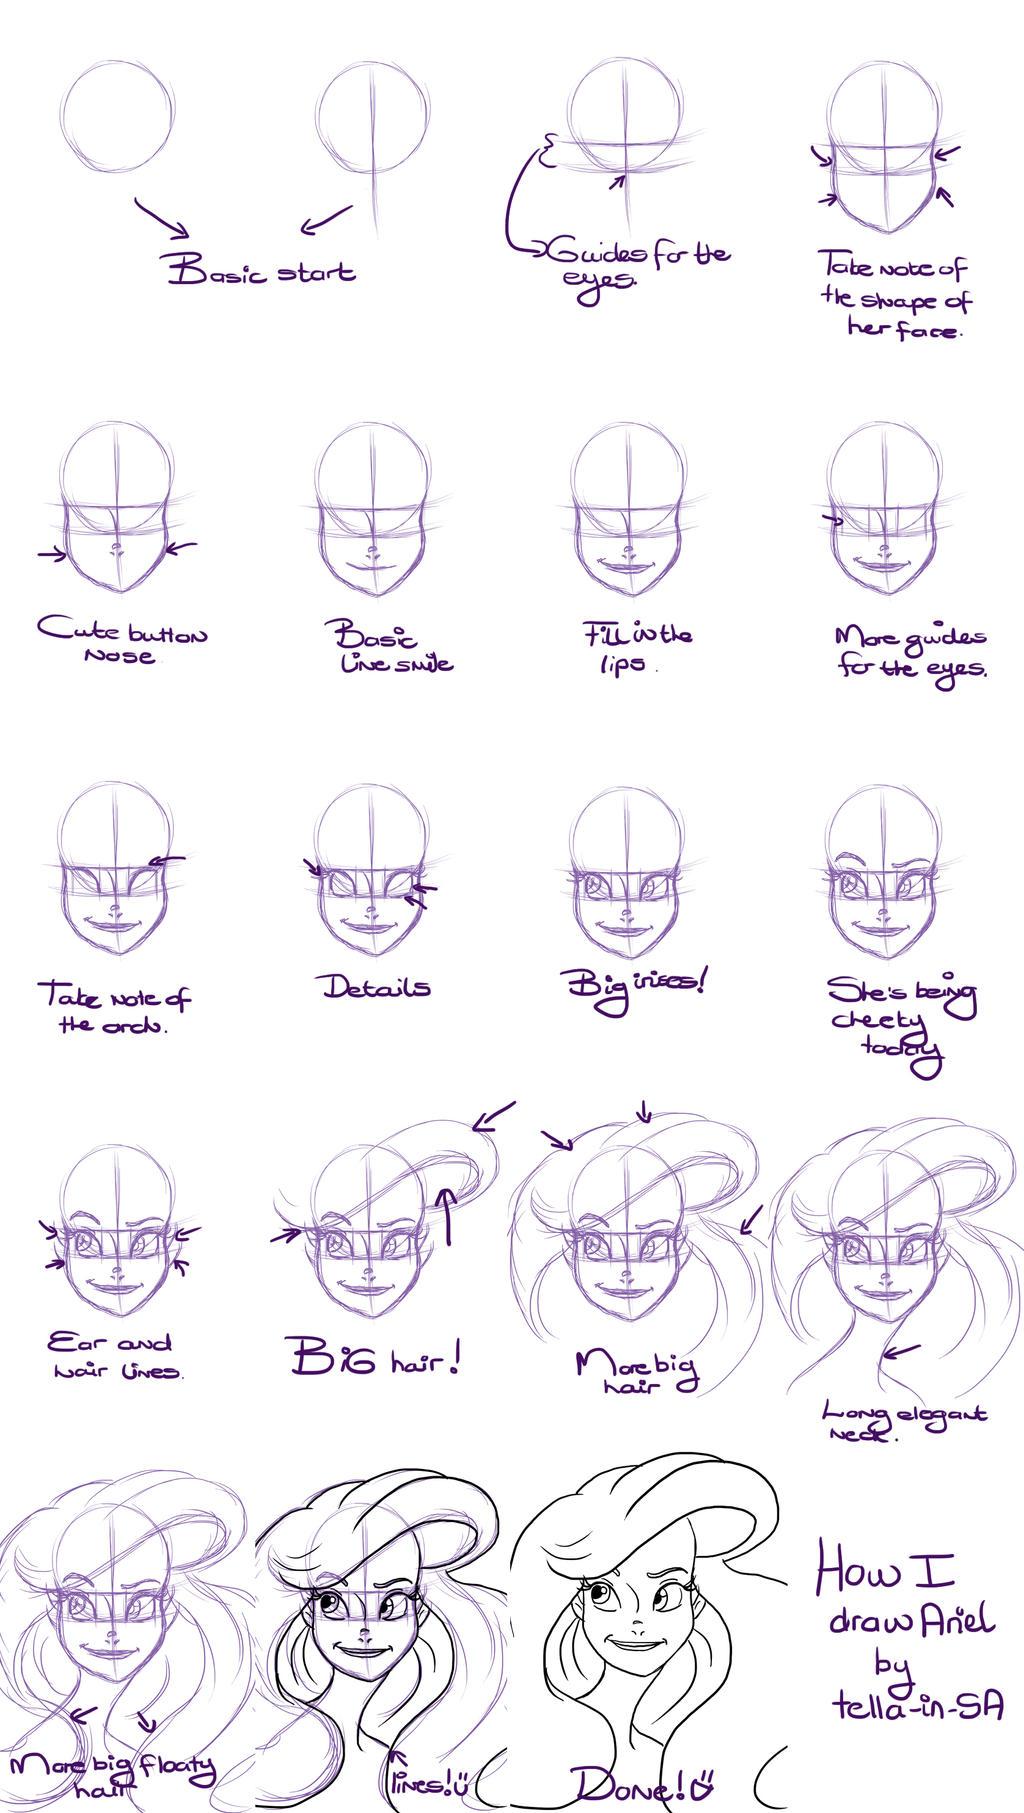 How I draw Ariel by Tella-in-SA on DeviantArt